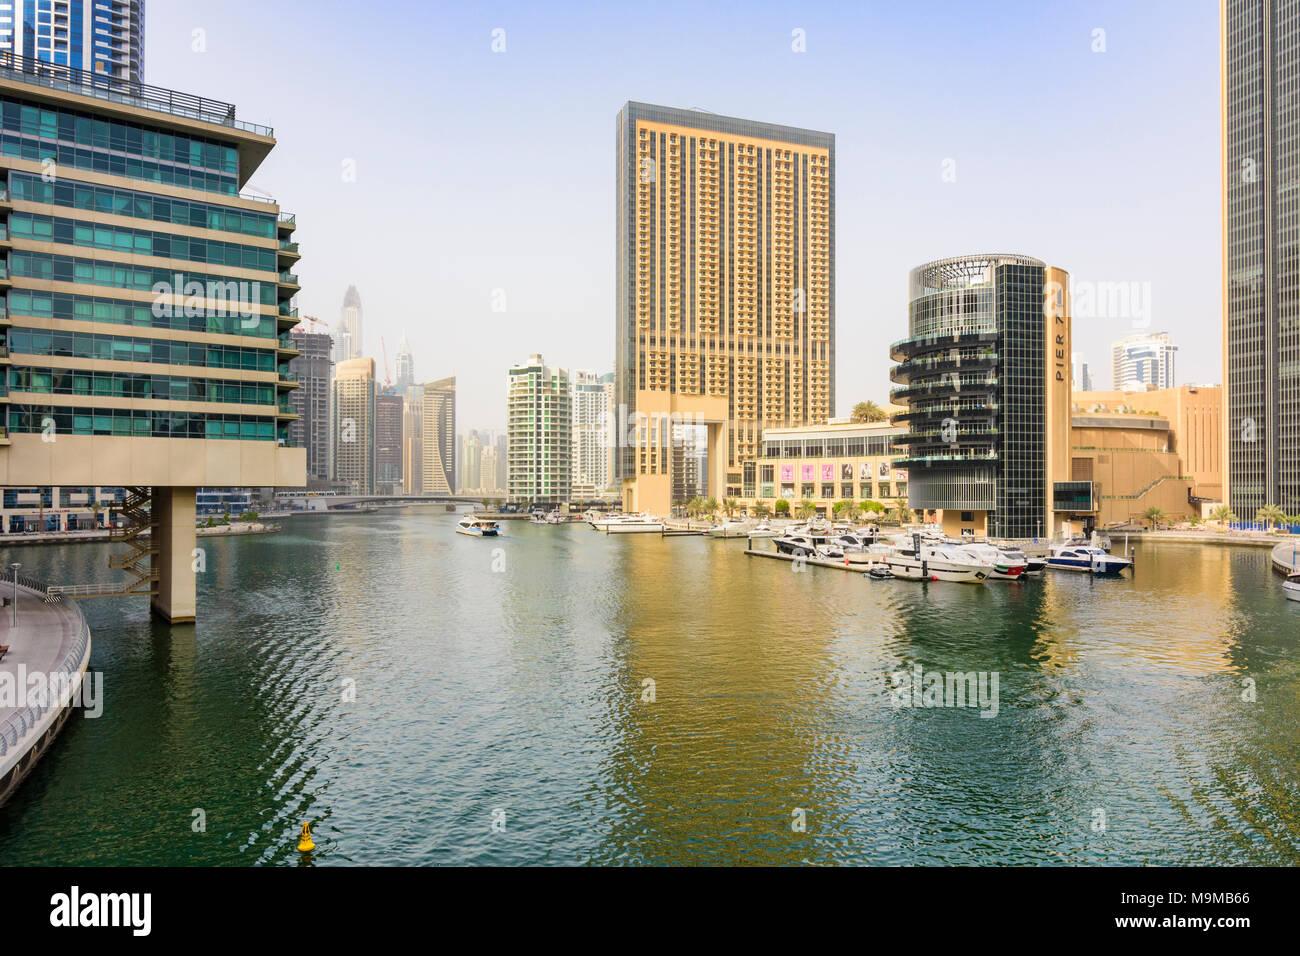 Dubai Marina high-rise buildings around Pier 7 restaurant development, Dubai Marina, Dubai, UAE - Stock Image